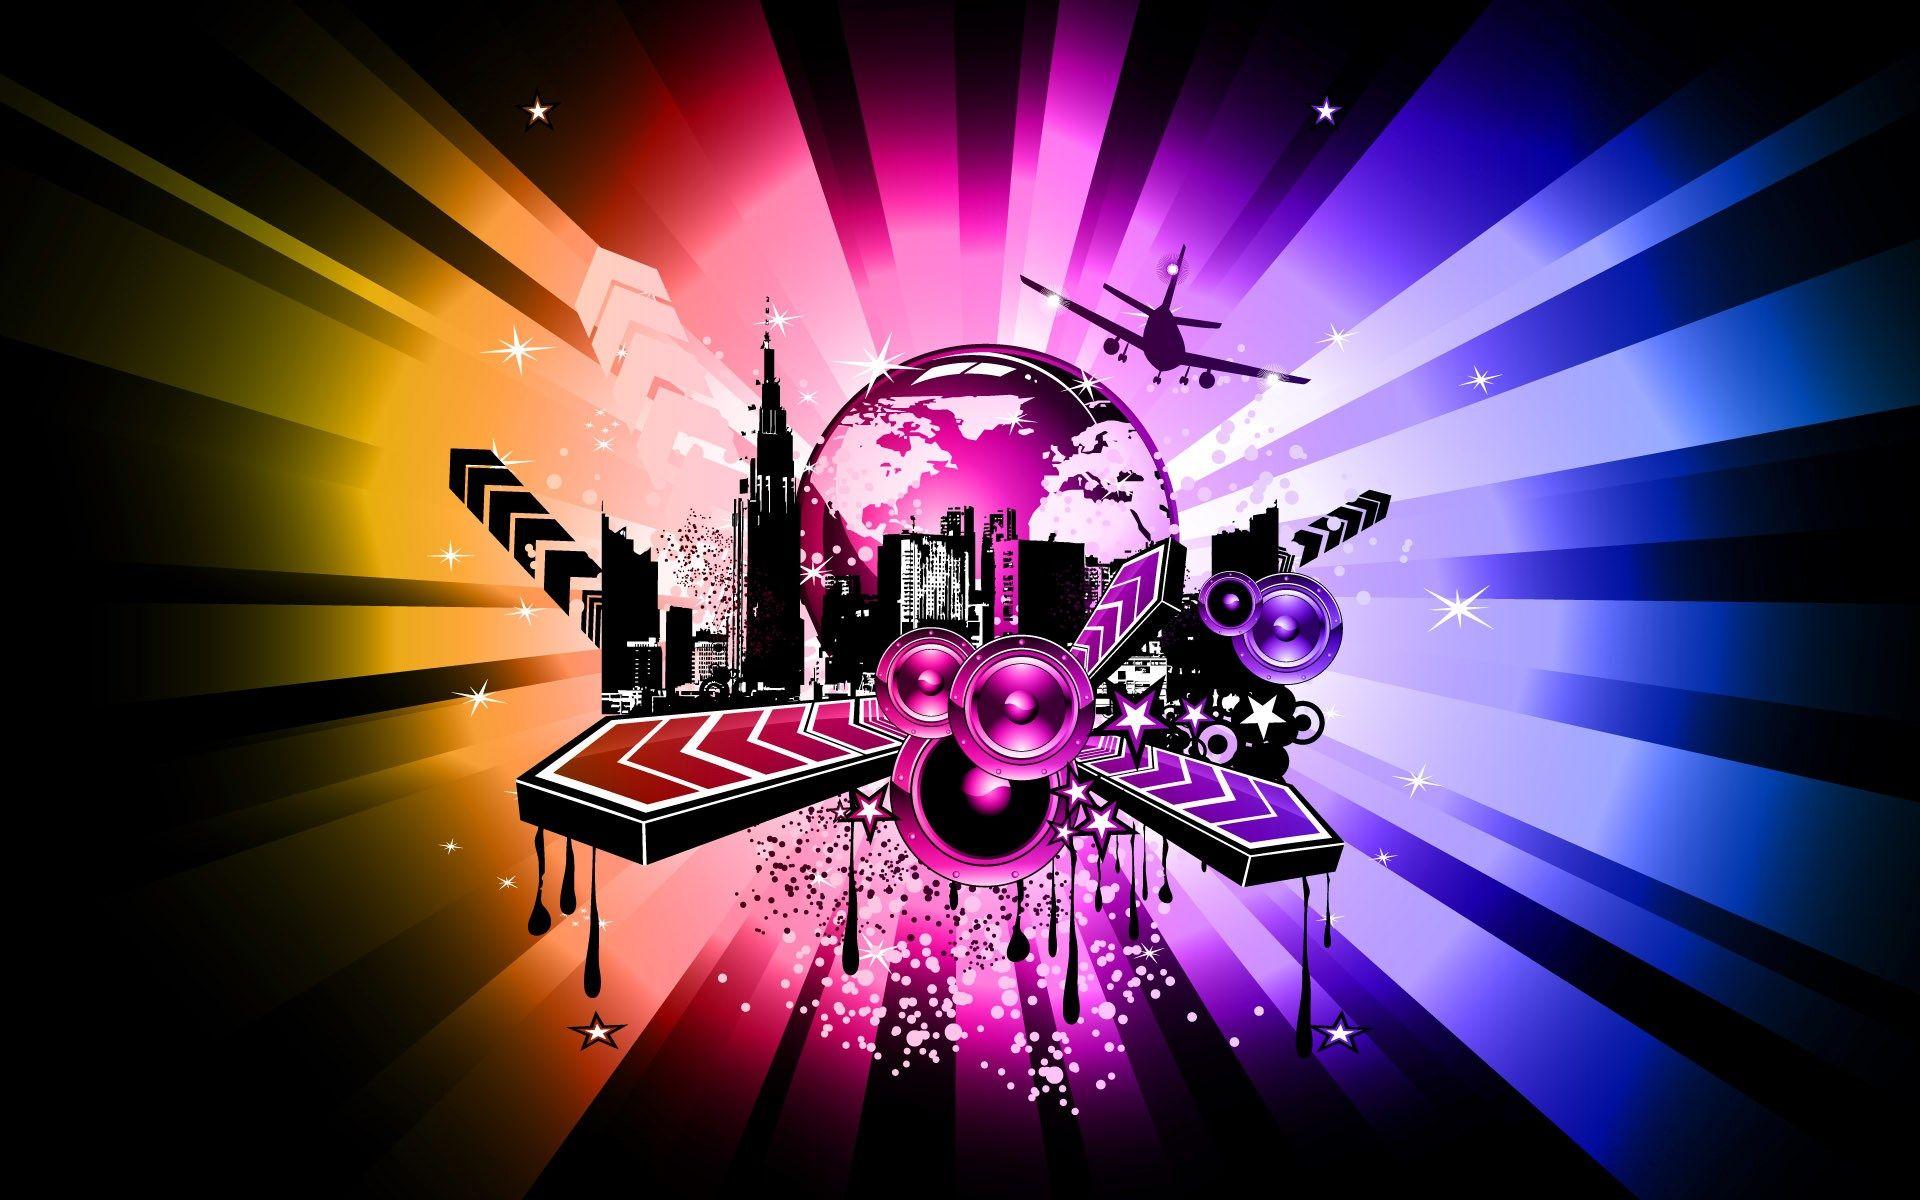 Best Wallpaper Music Macbook - 4273345a1b72a36a939ebc8fc0642818  You Should Have_74421.jpg